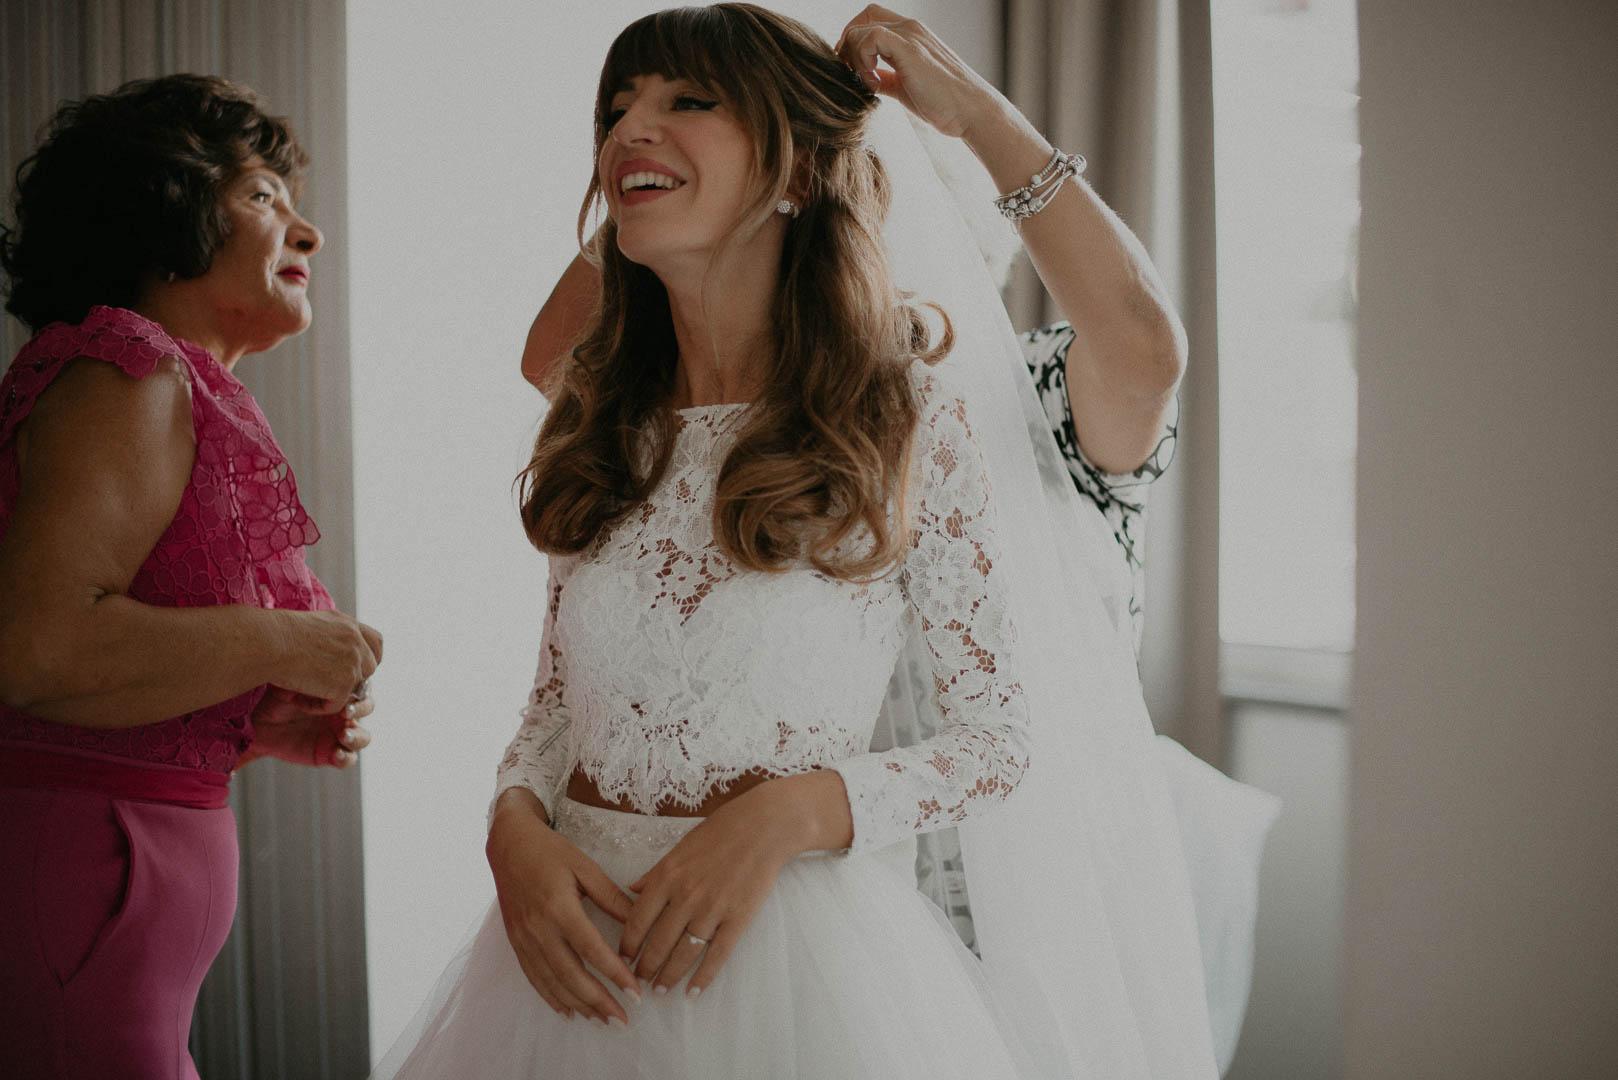 wedding-photographer-destination-fineart-bespoke-reportage-napoli-nabilah-vivianeizzo-spazio46-50